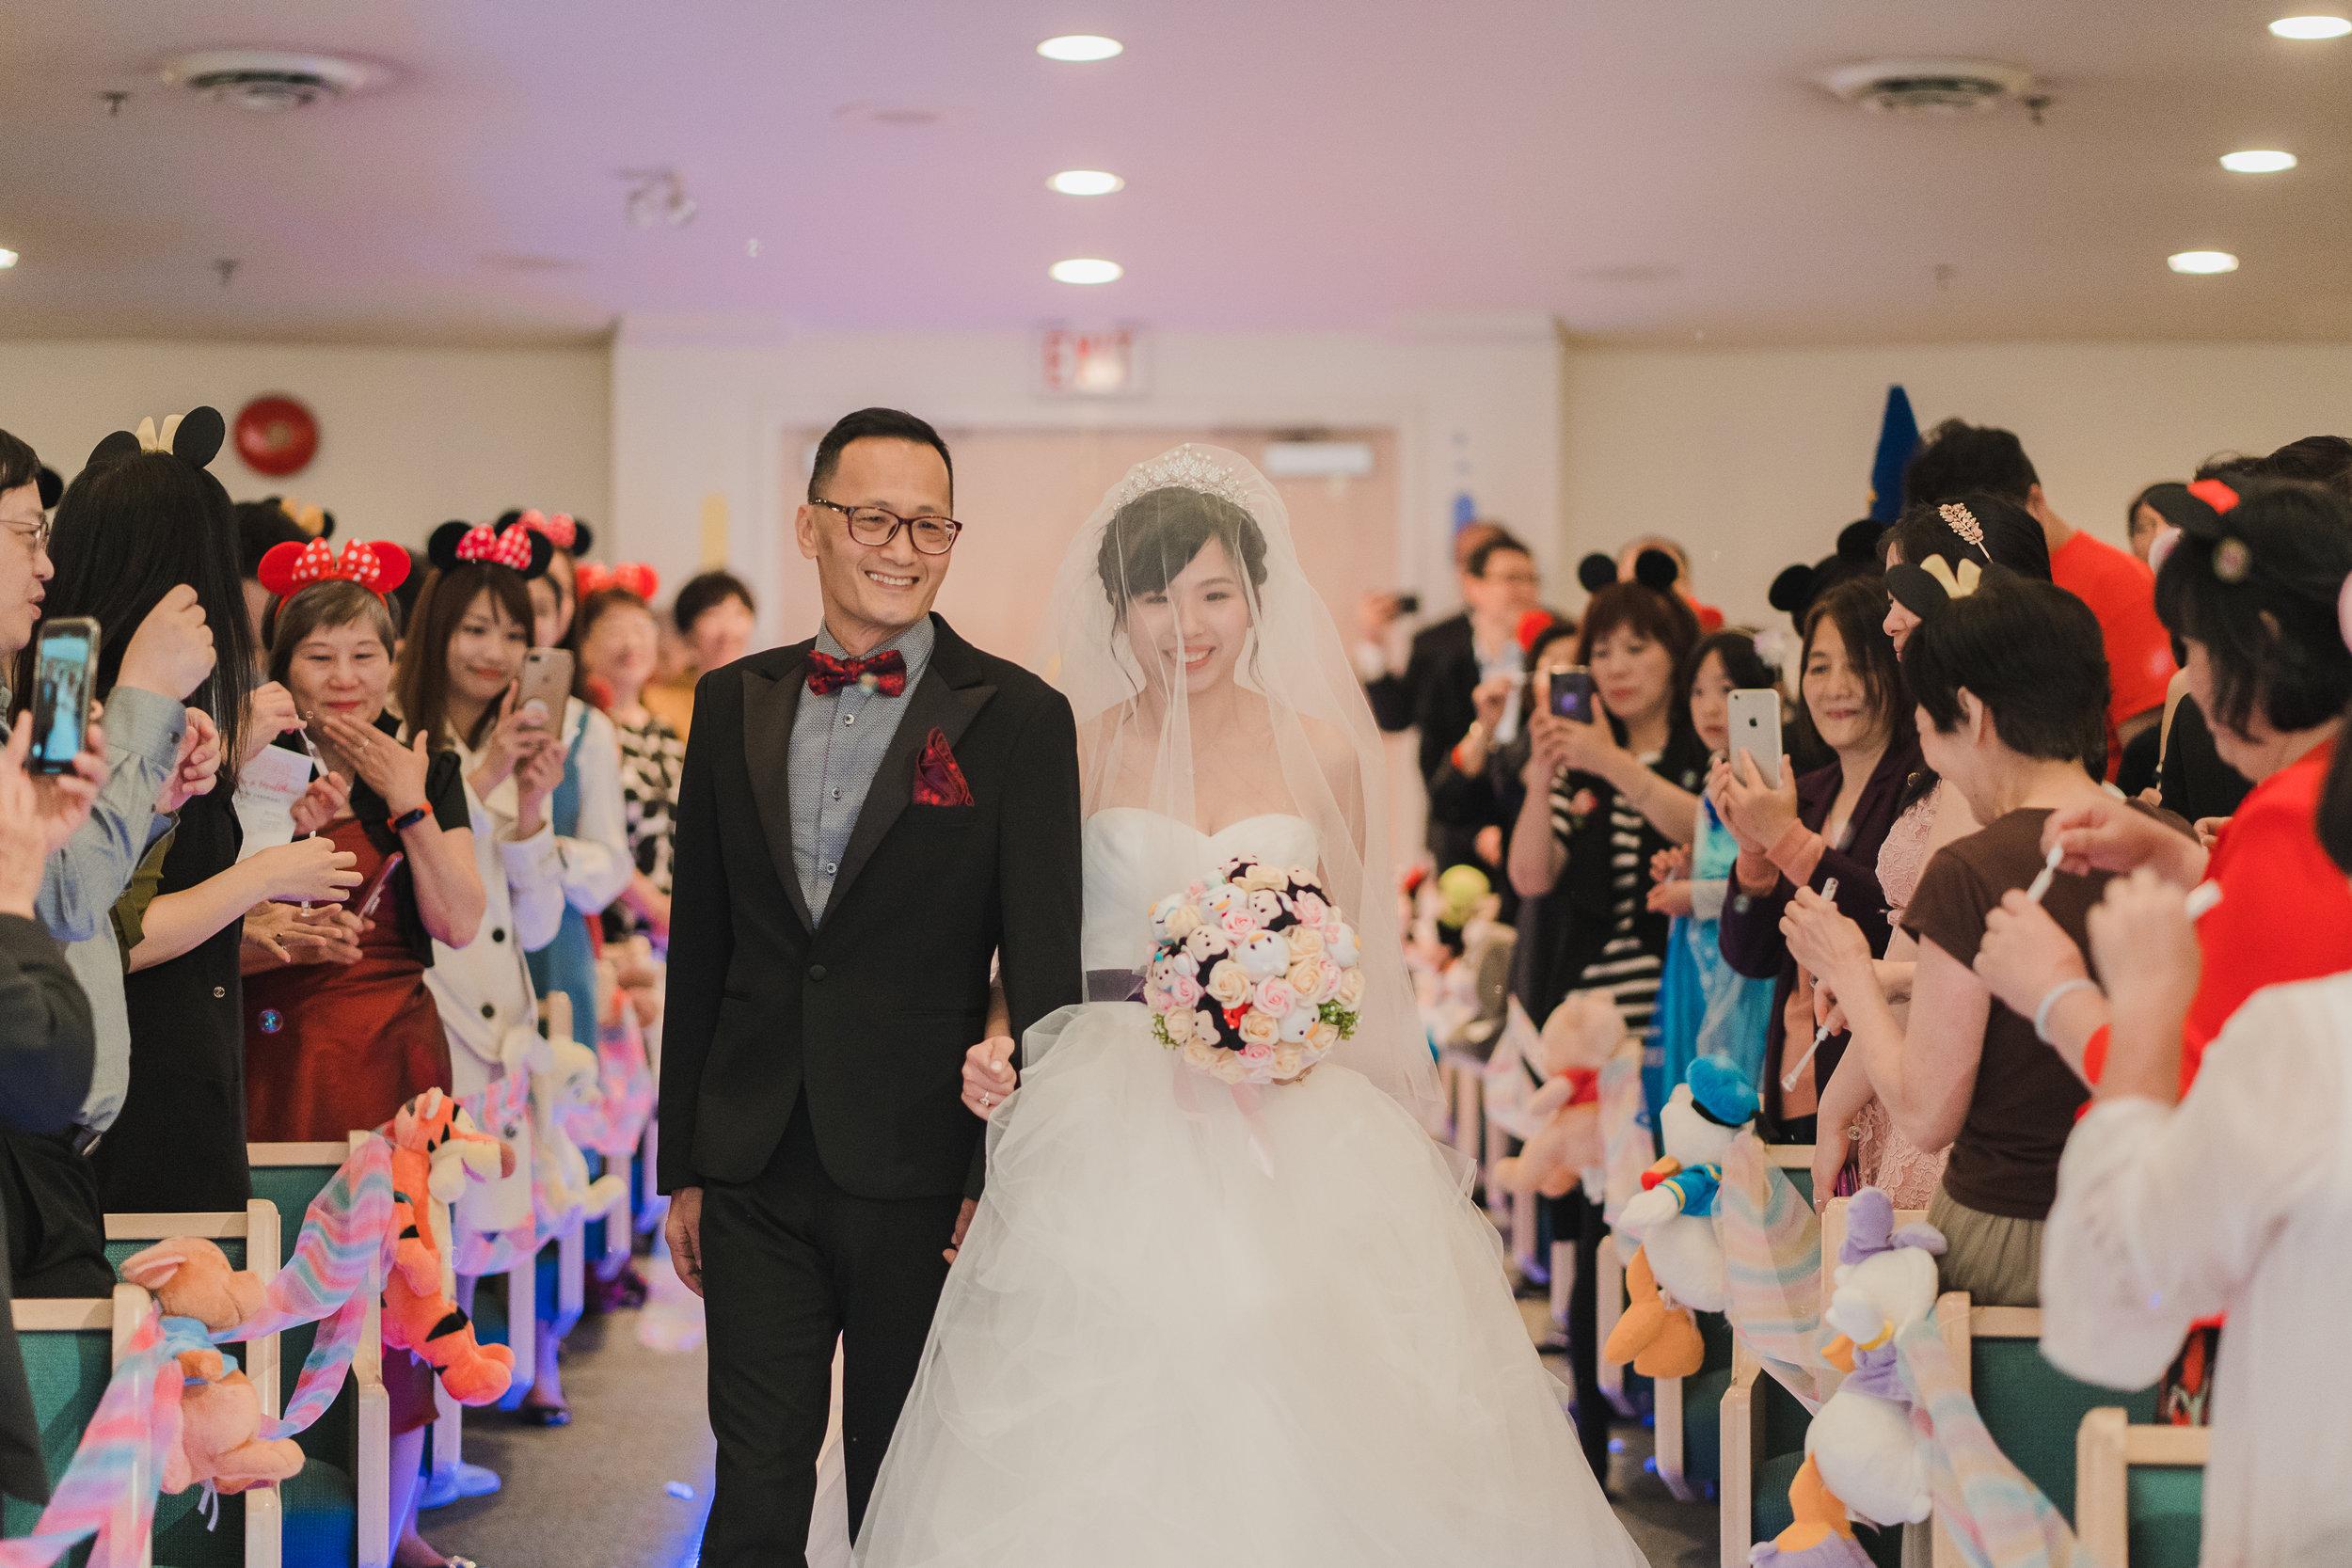 20190520 - Pamela & Matthew Wedding - 0113.jpg